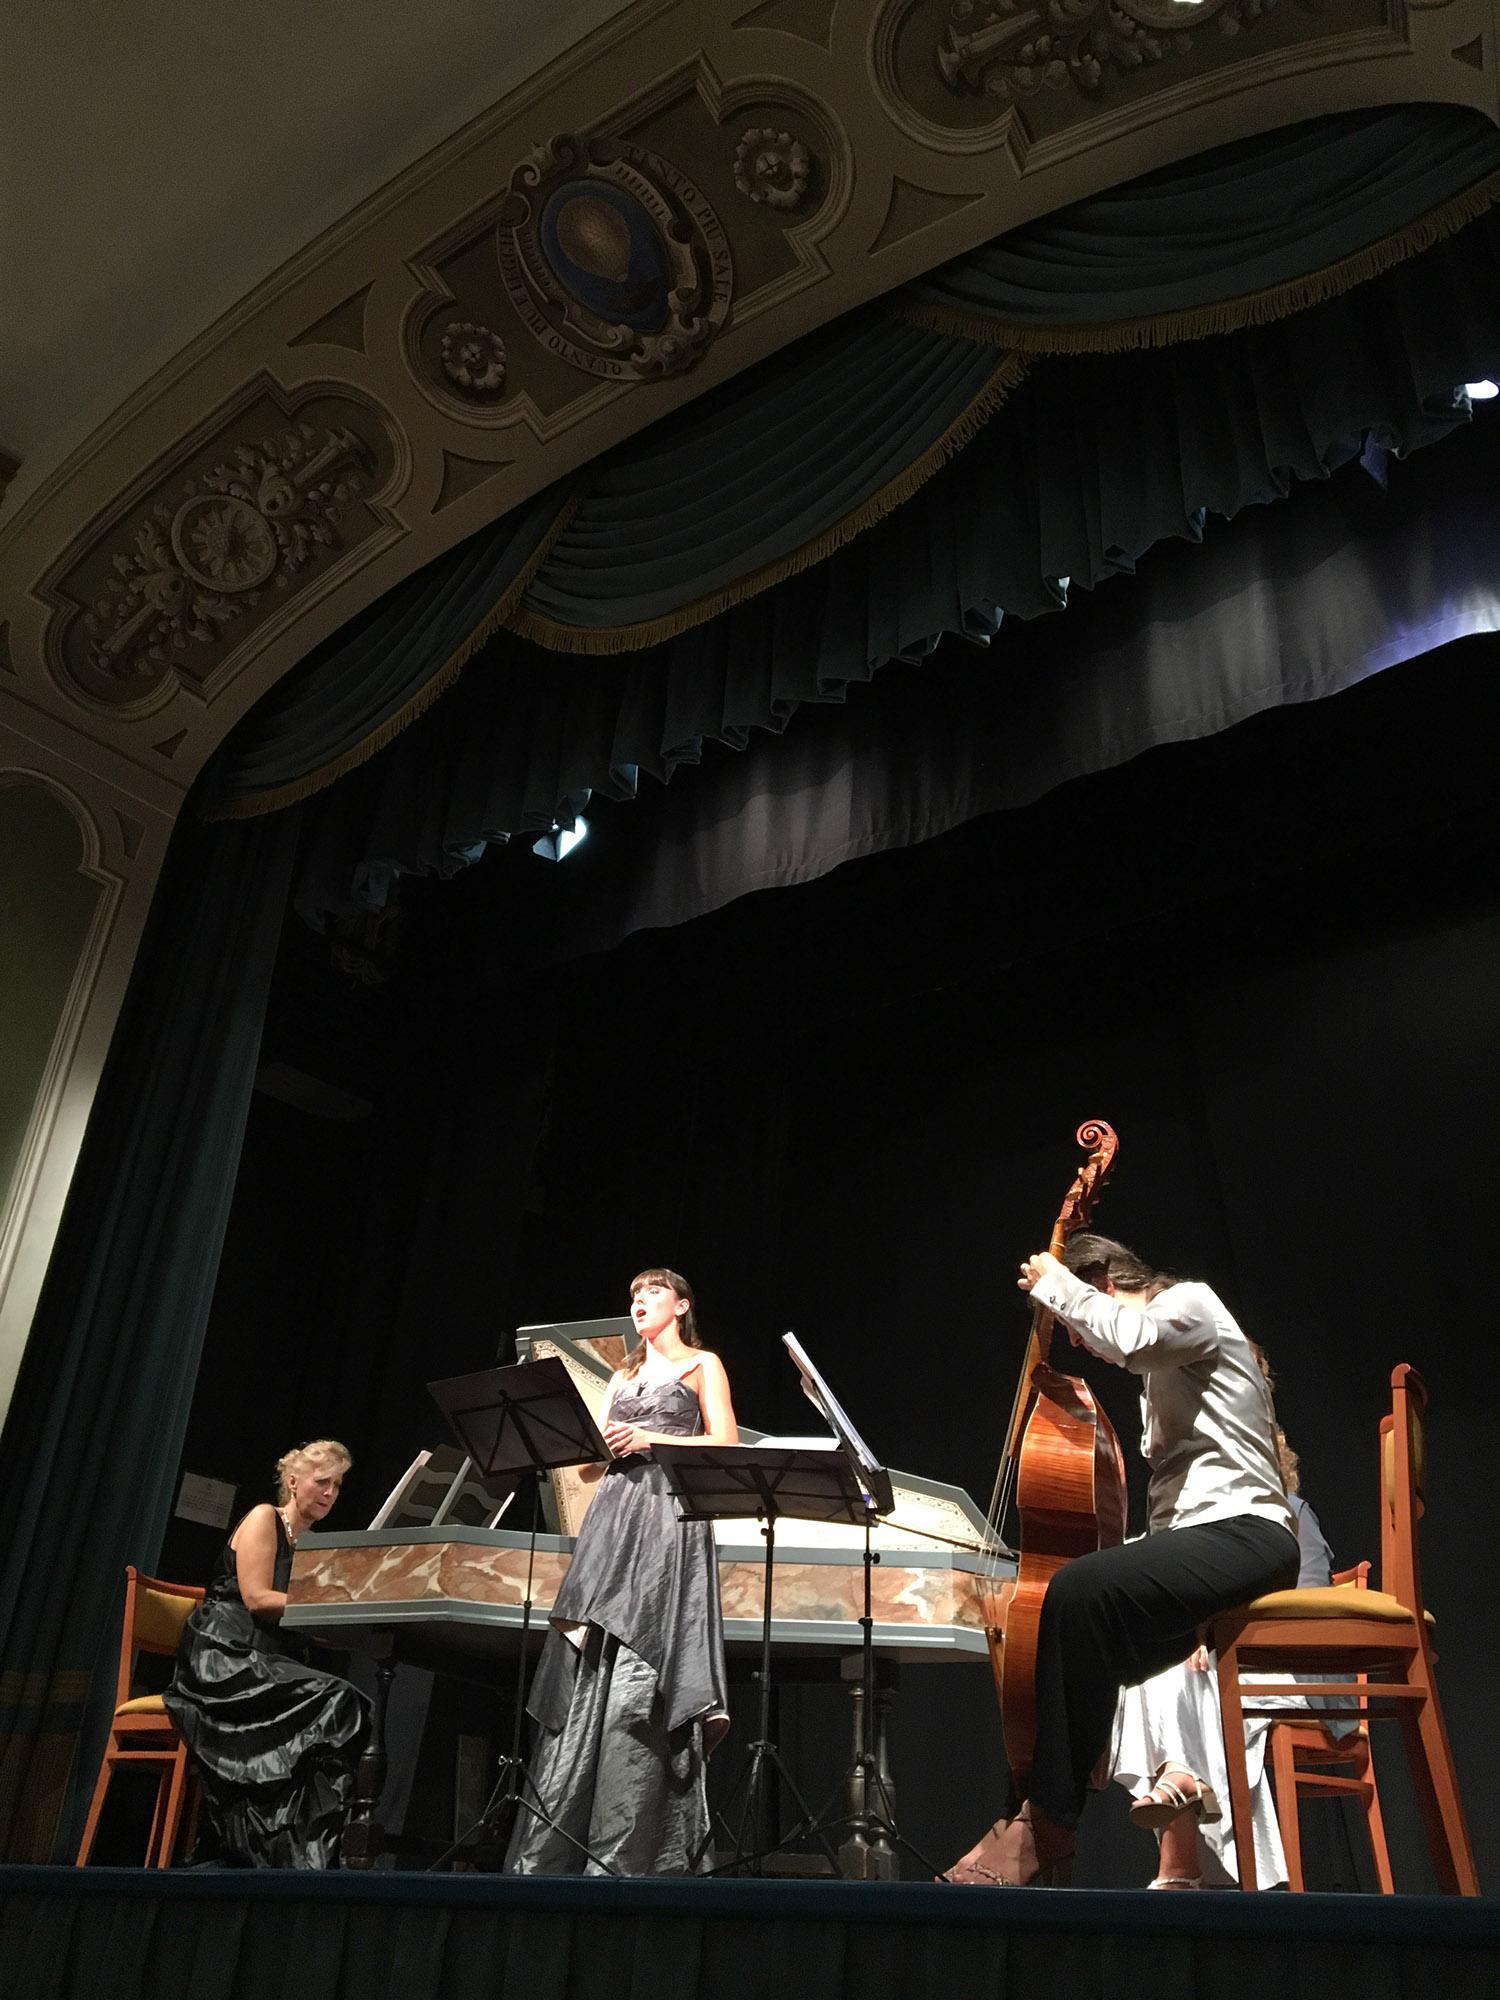 A concert during the Baroque festival organised by the Accademia dei Leggieri in Teatro dei Leggieri in September. - © Carolina Taddei